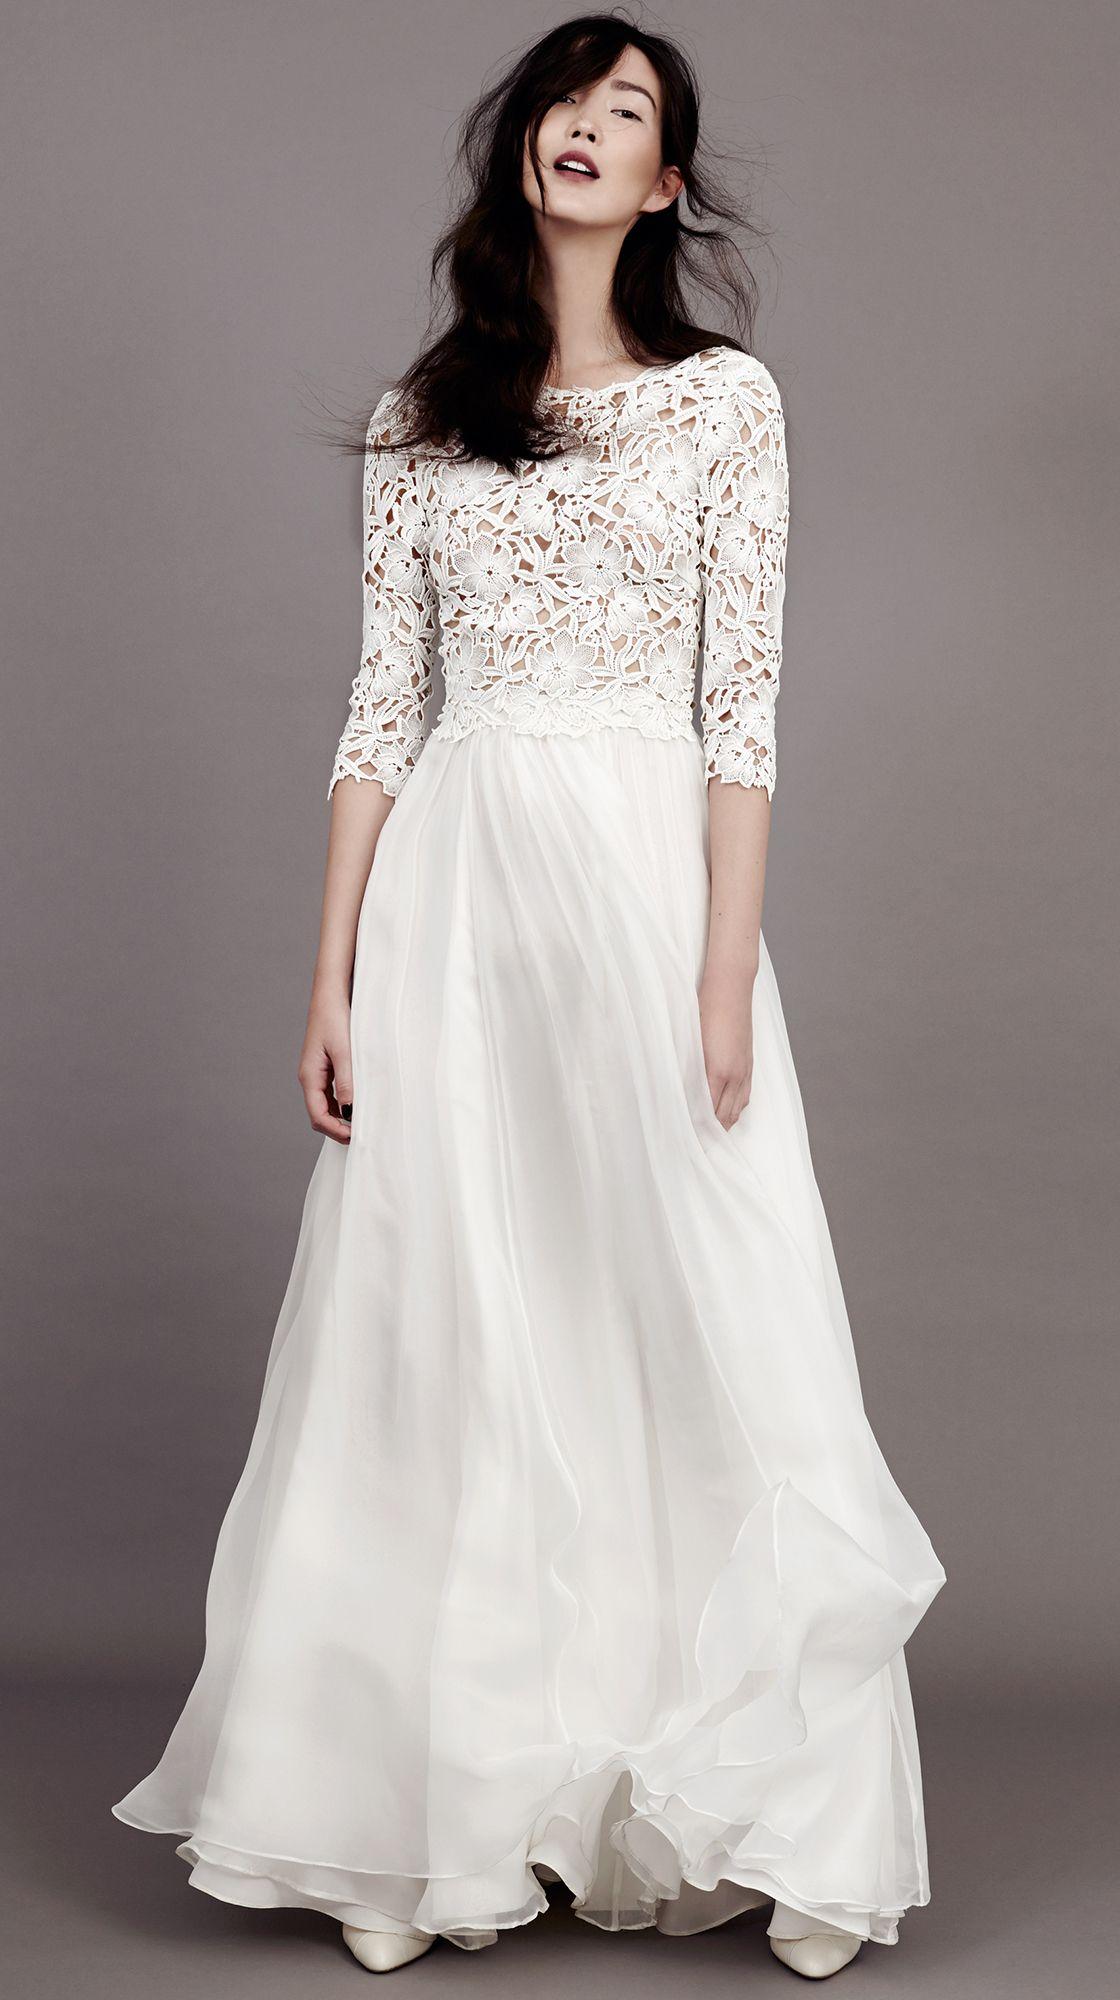 Pin by Tatiana on Fashion   Pinterest   Wedding, Stunning wedding ...